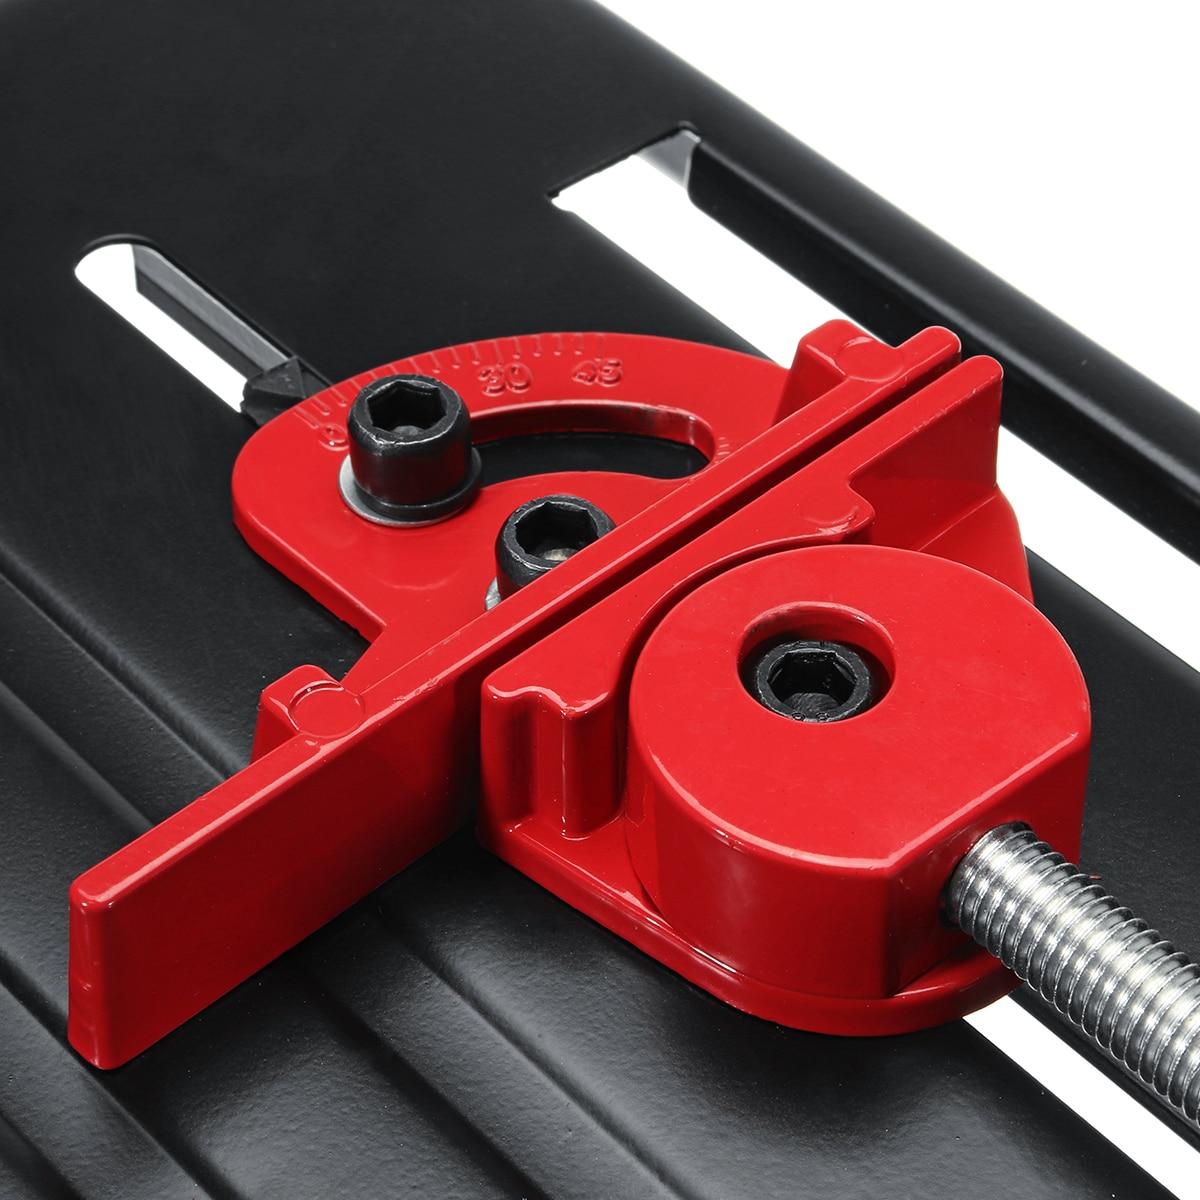 Angle Grinder Stand Angle Grinder Bracket Holder Support For 100-125 Cutter Angle Grinder Cast Iron Base Power Tool Accessory enlarge